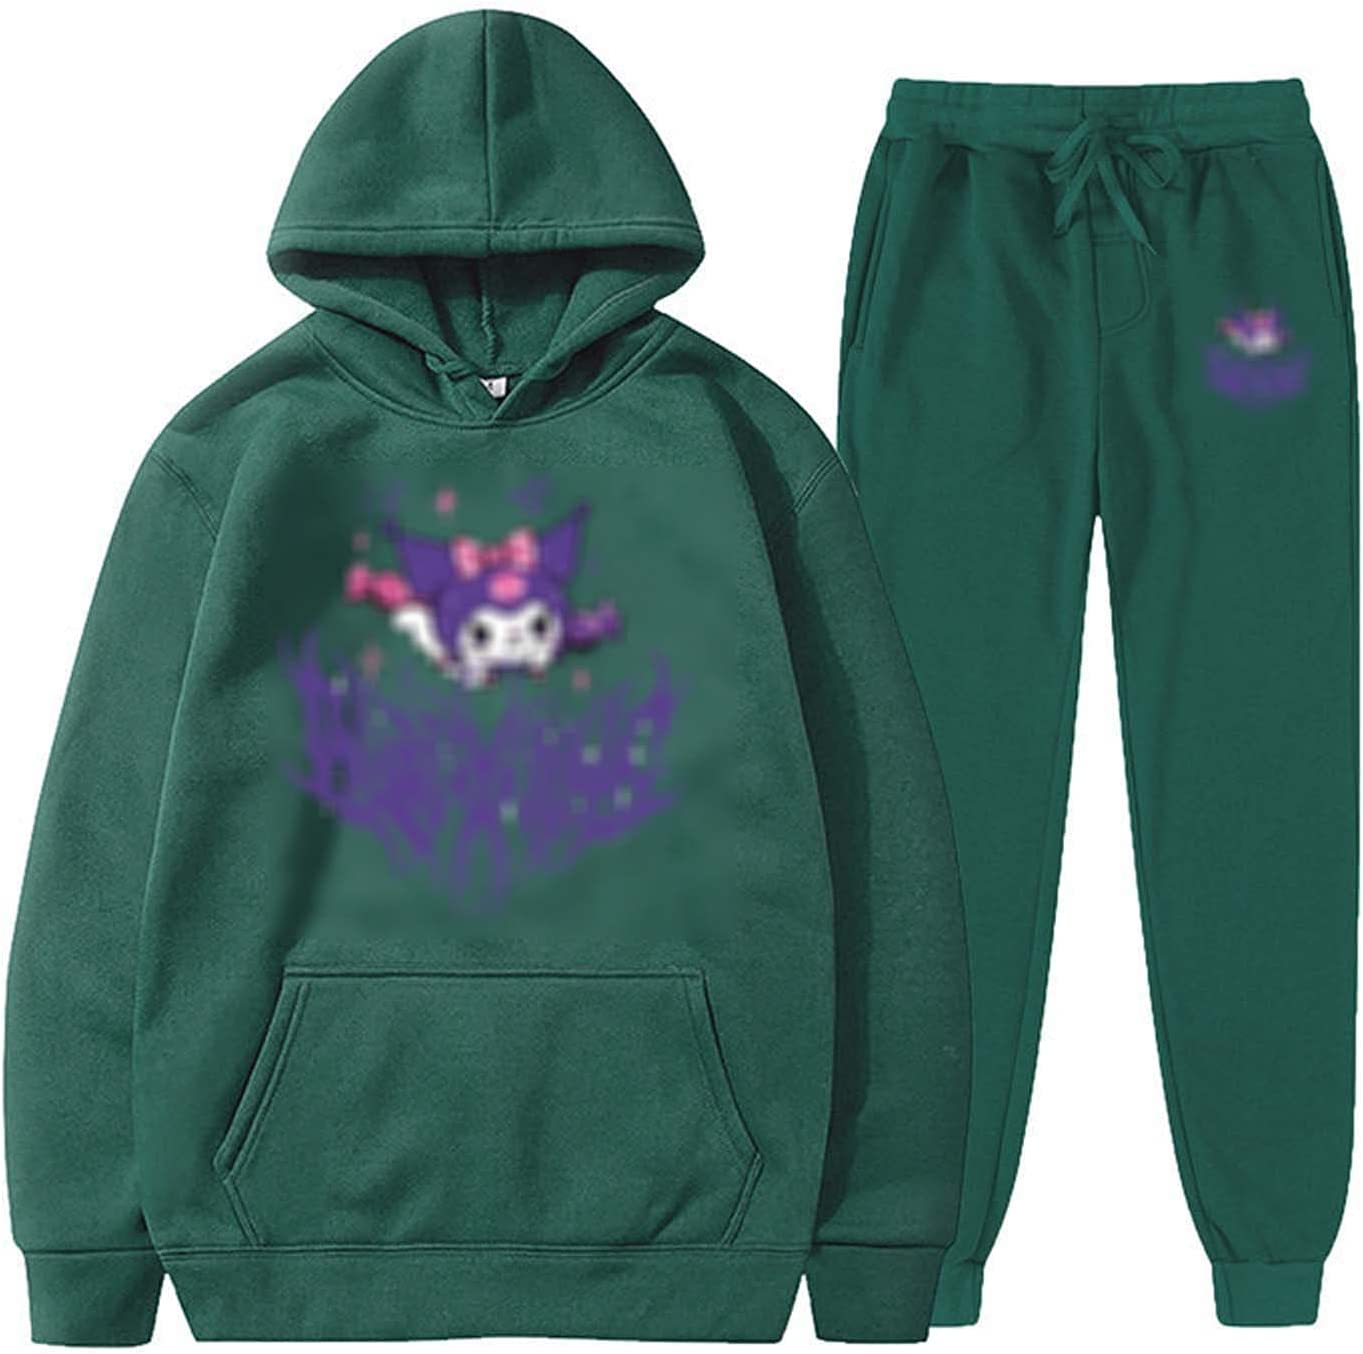 HUSHION Men's Sportswear Hooded Sweatshirt 2 To Piece Set Time sale Hoodie Award